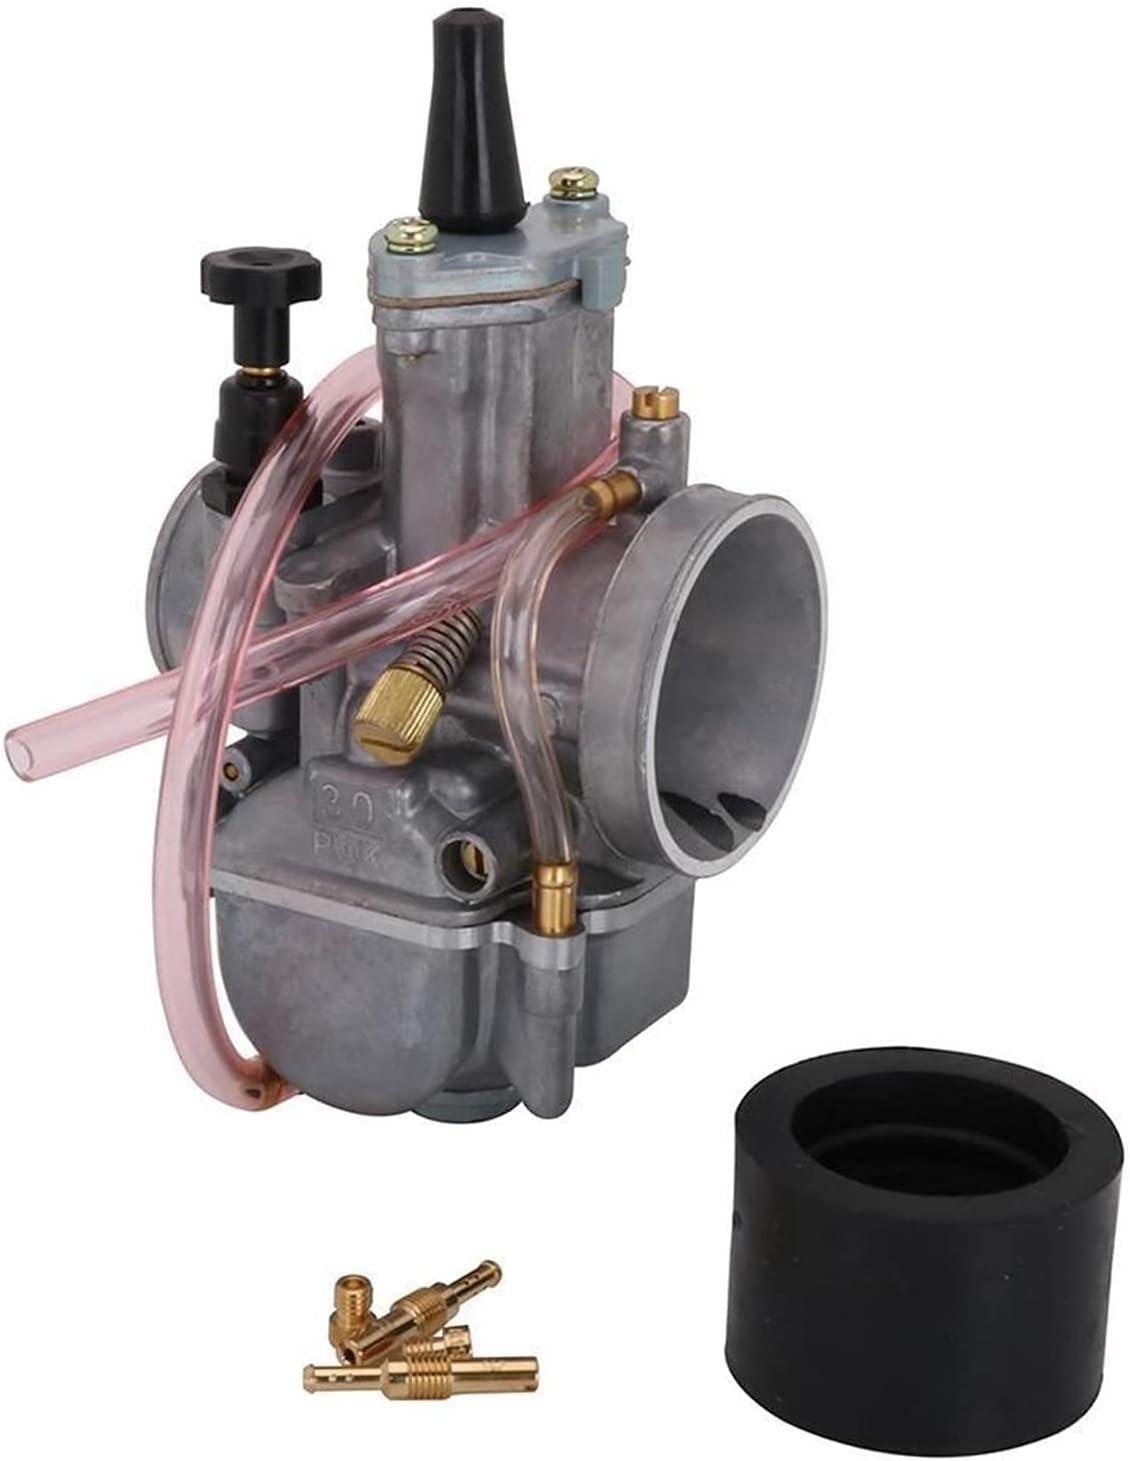 Replacement Motorcycle PWK 21 24 26 Carburetor 70% OFF [Alternative dealer] Outlet 34MM 32 30 28 F